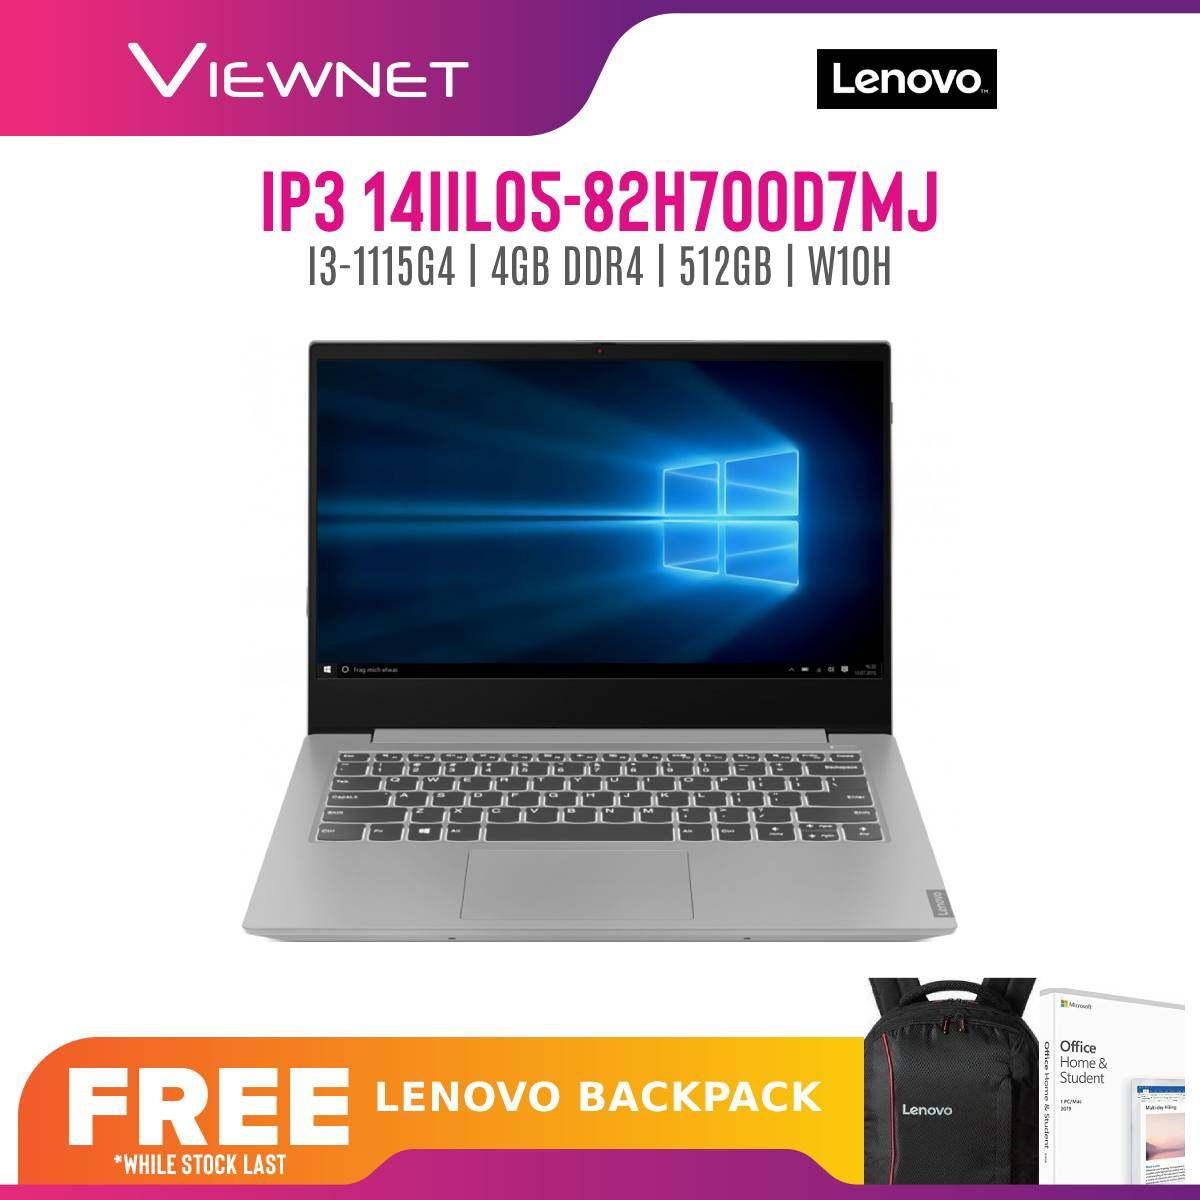 LENOVO IDEAPAD 3 14ITL6-82H700D8MJ LAPTOP (PLATINUM GREY) (I3-1115G4/4GB/512GB/14 FHD/INTEL UHD/W10/1YR/MS OFF HOME & STUDENT) + FREE BACKPACK